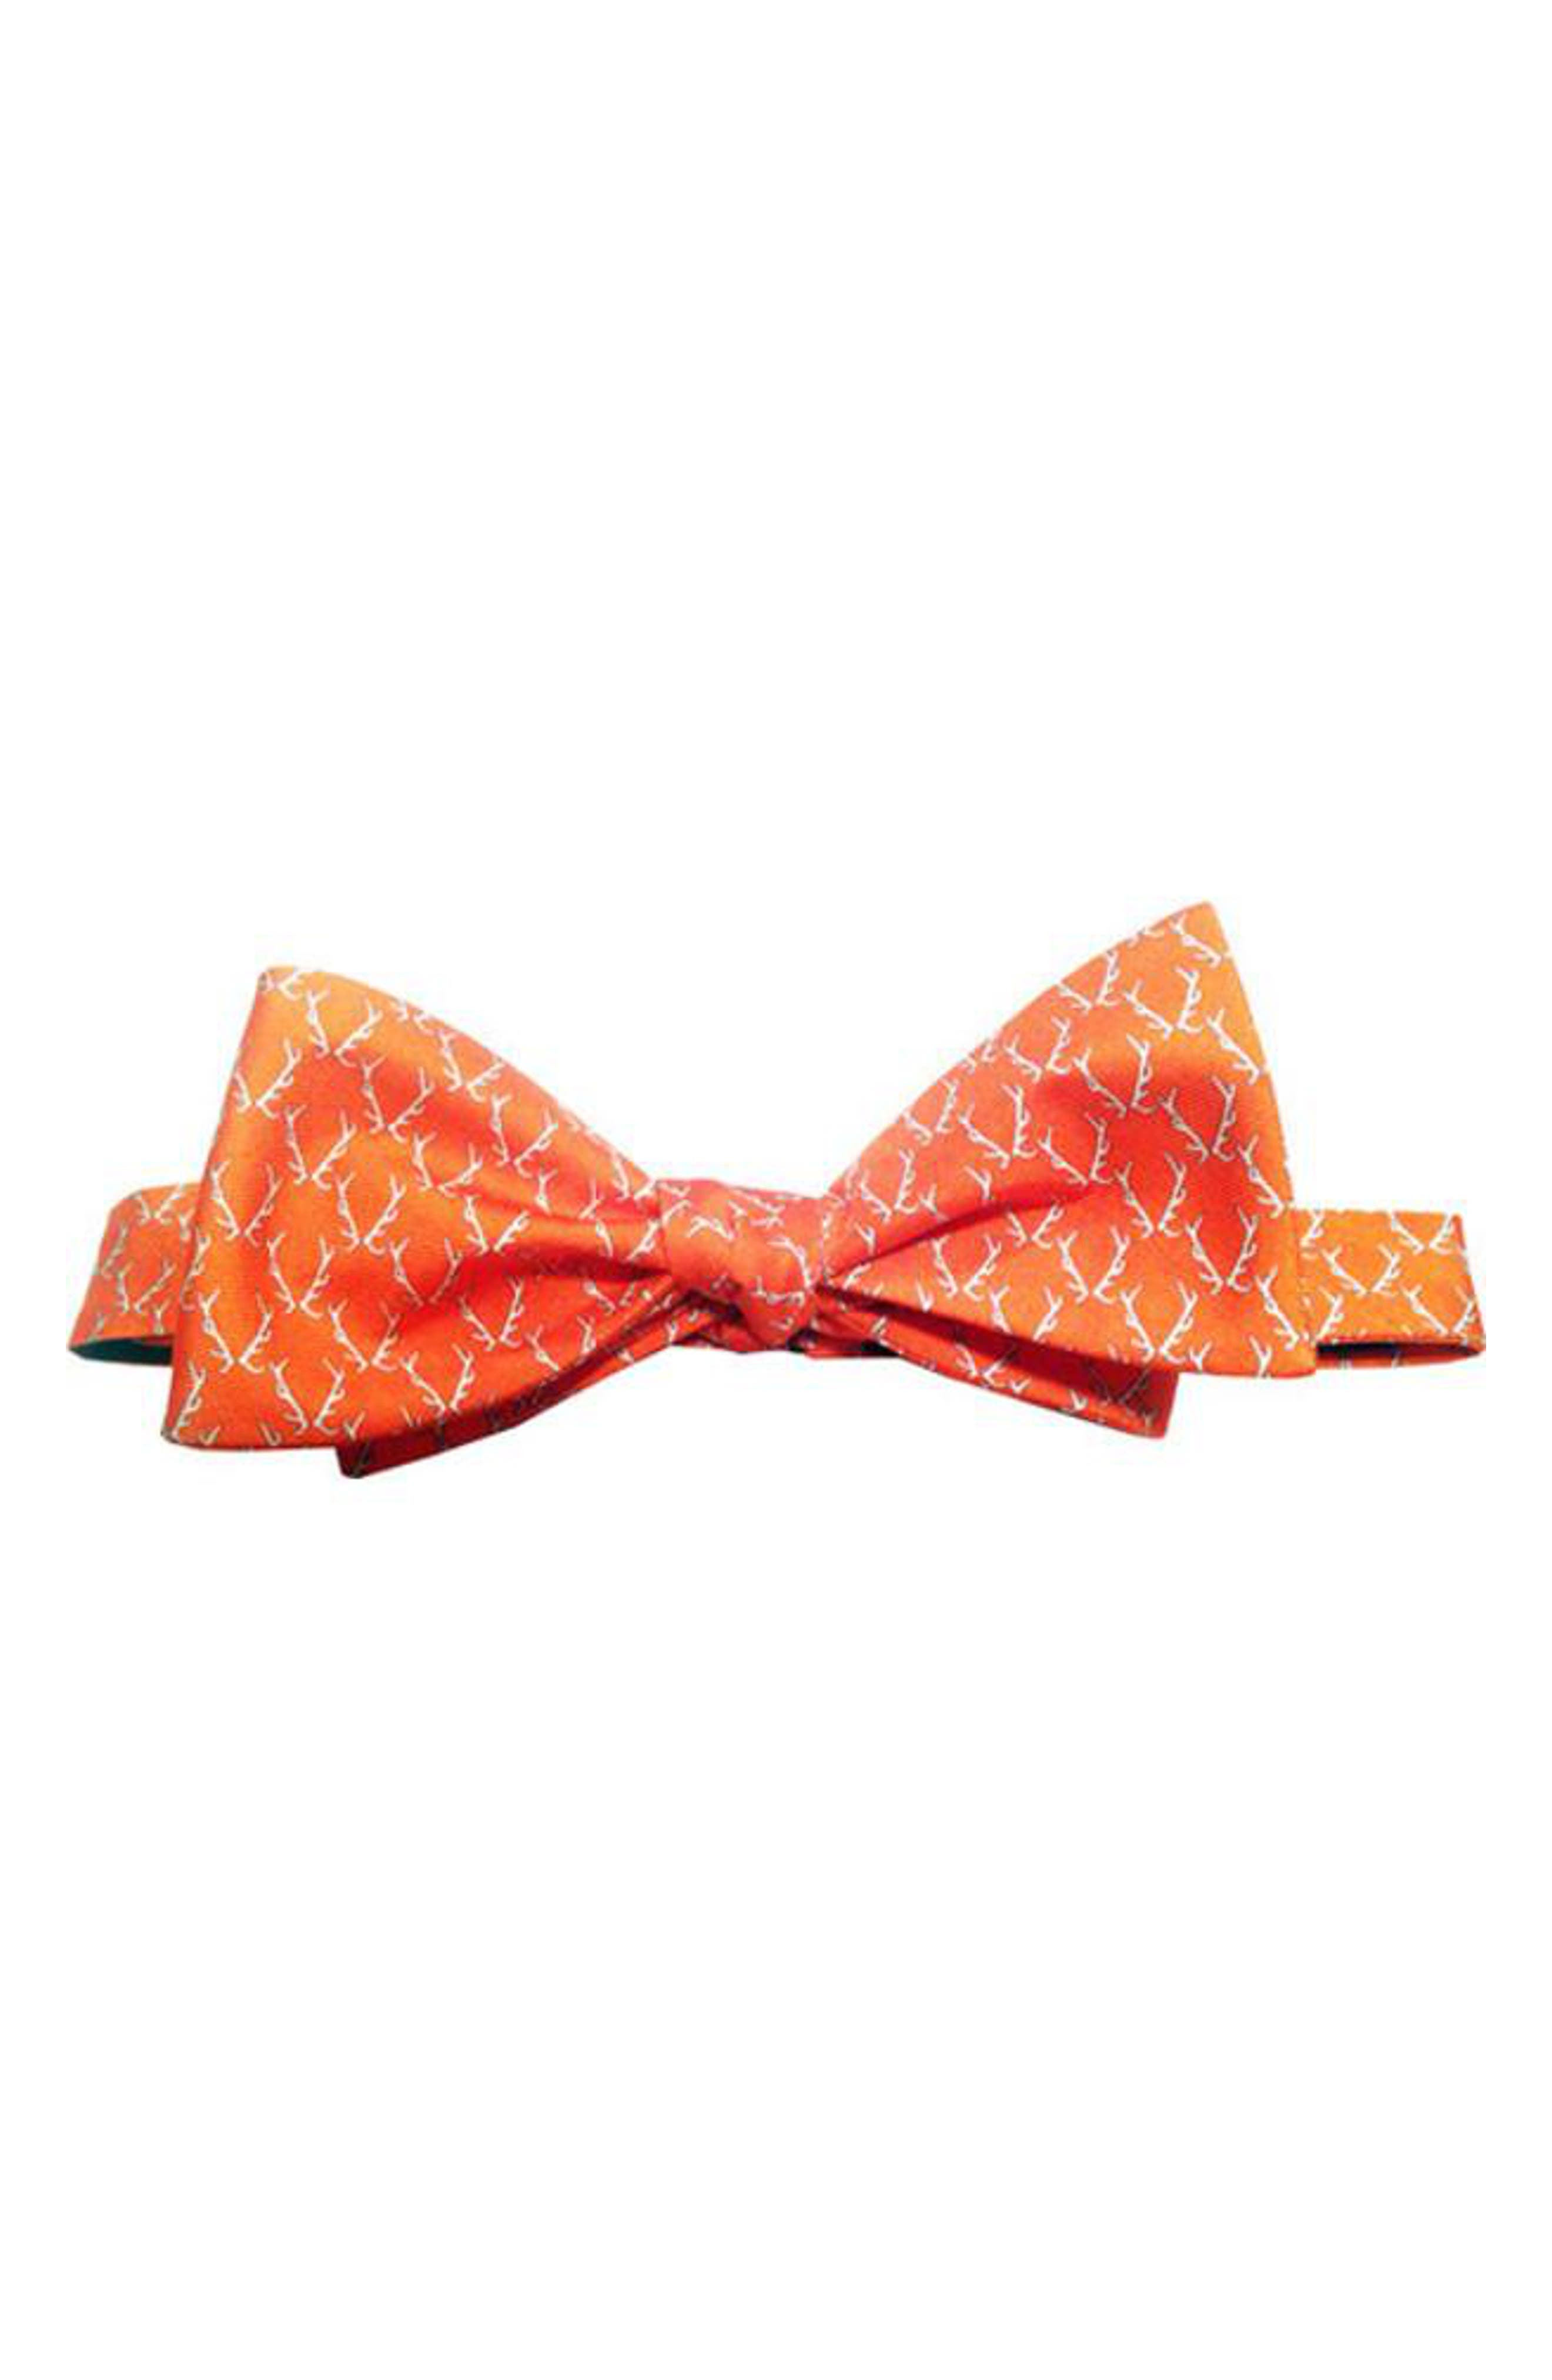 Buckwild Silk Bow Tie,                         Main,                         color, 800